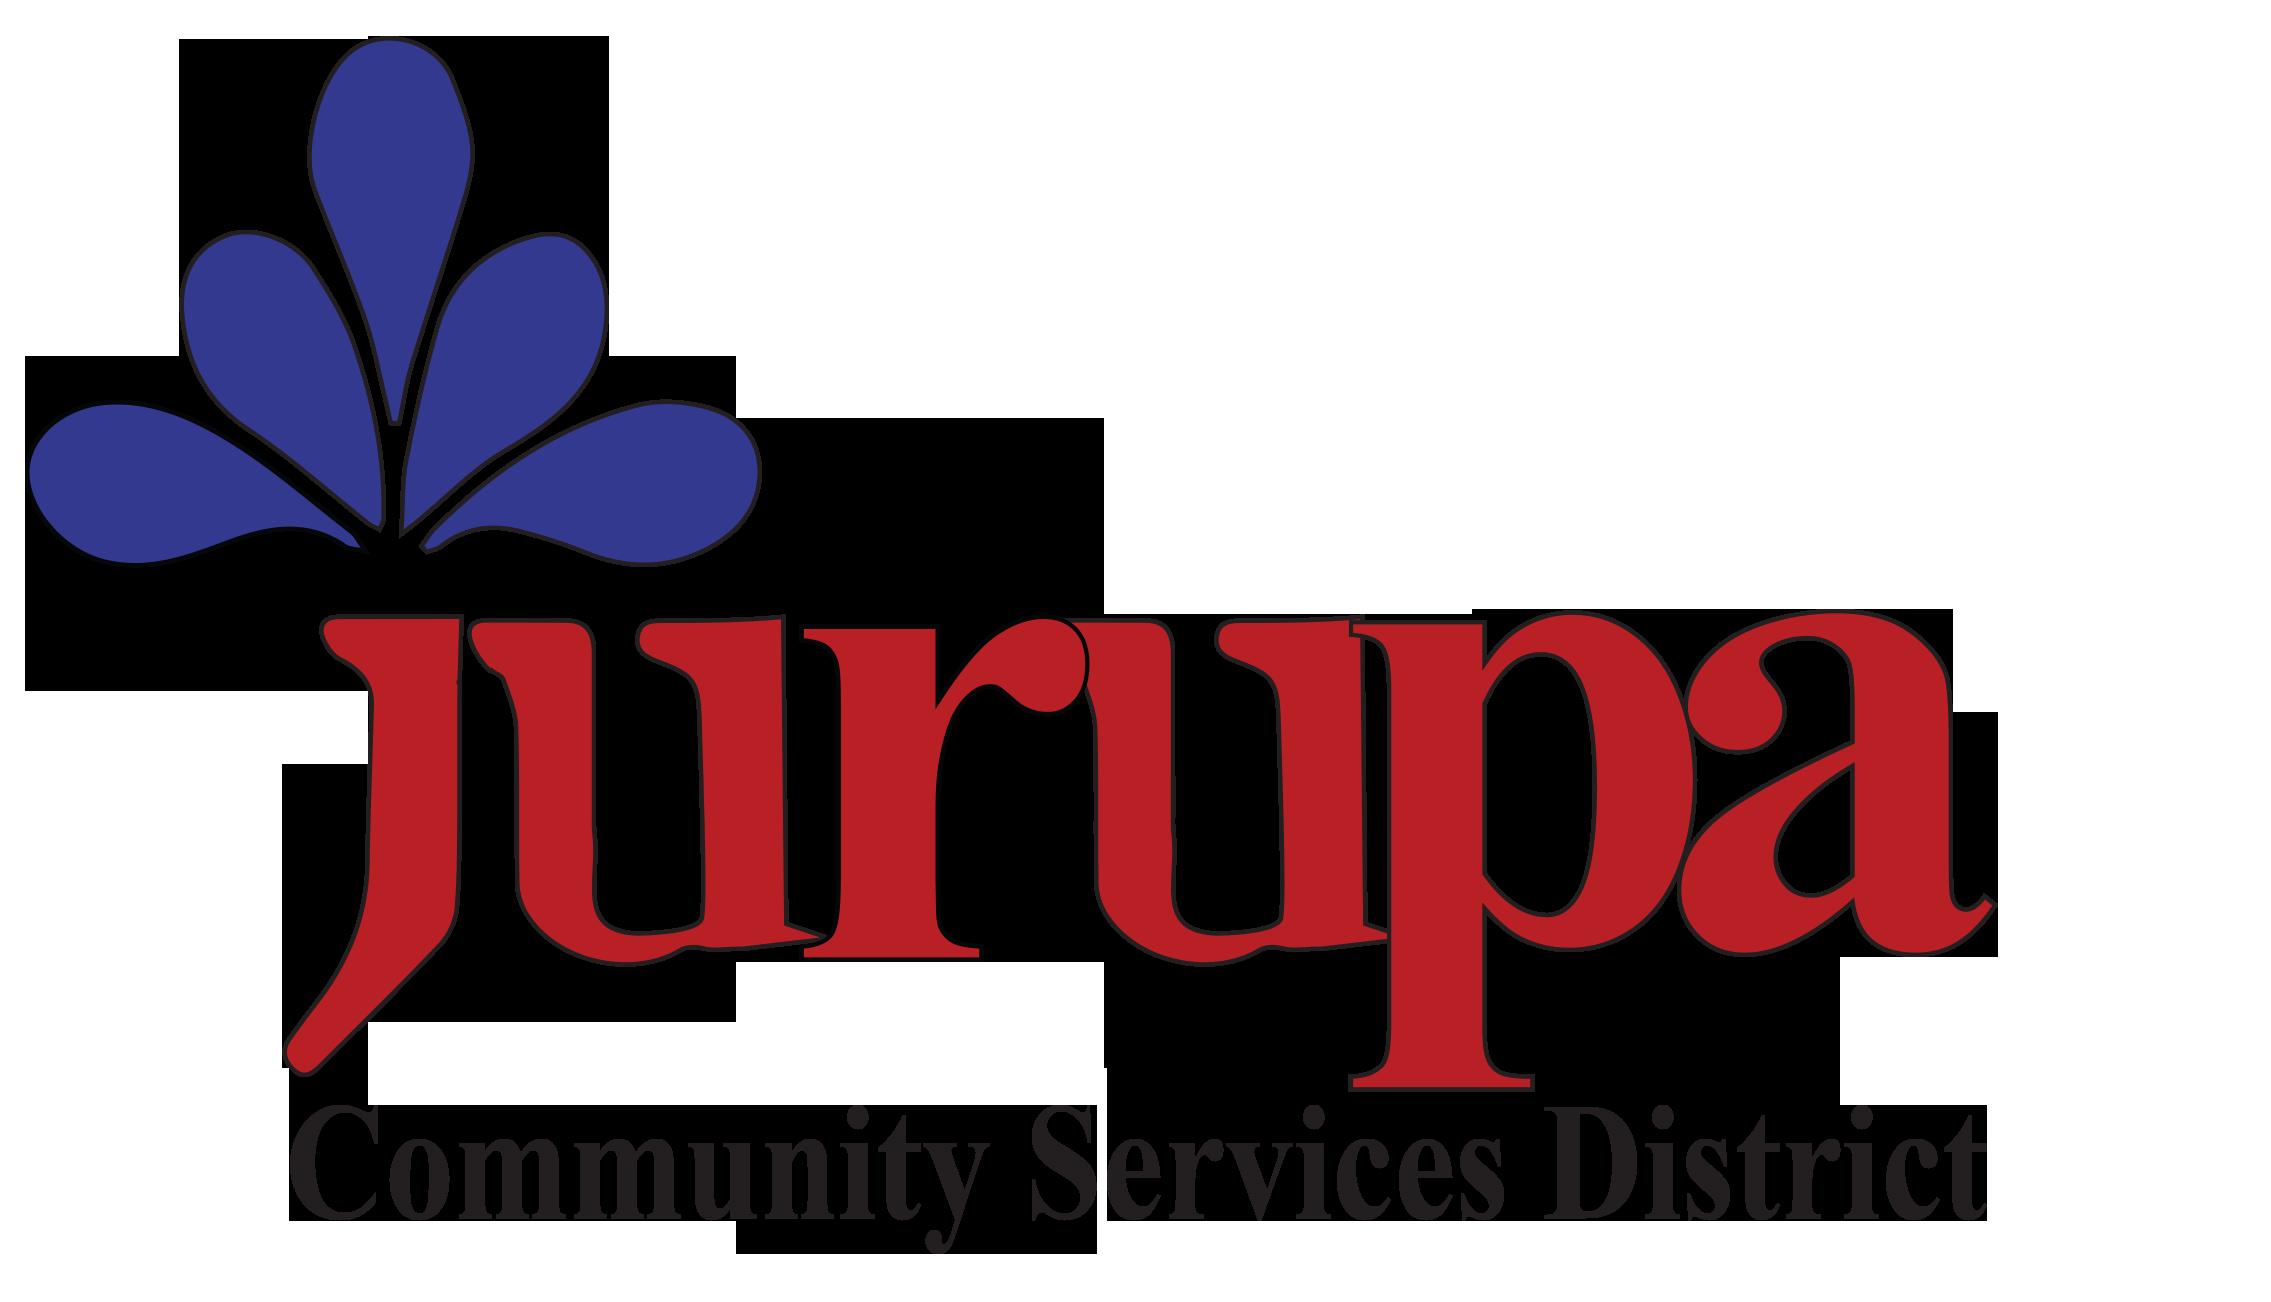 Jurupa Community Services District logo